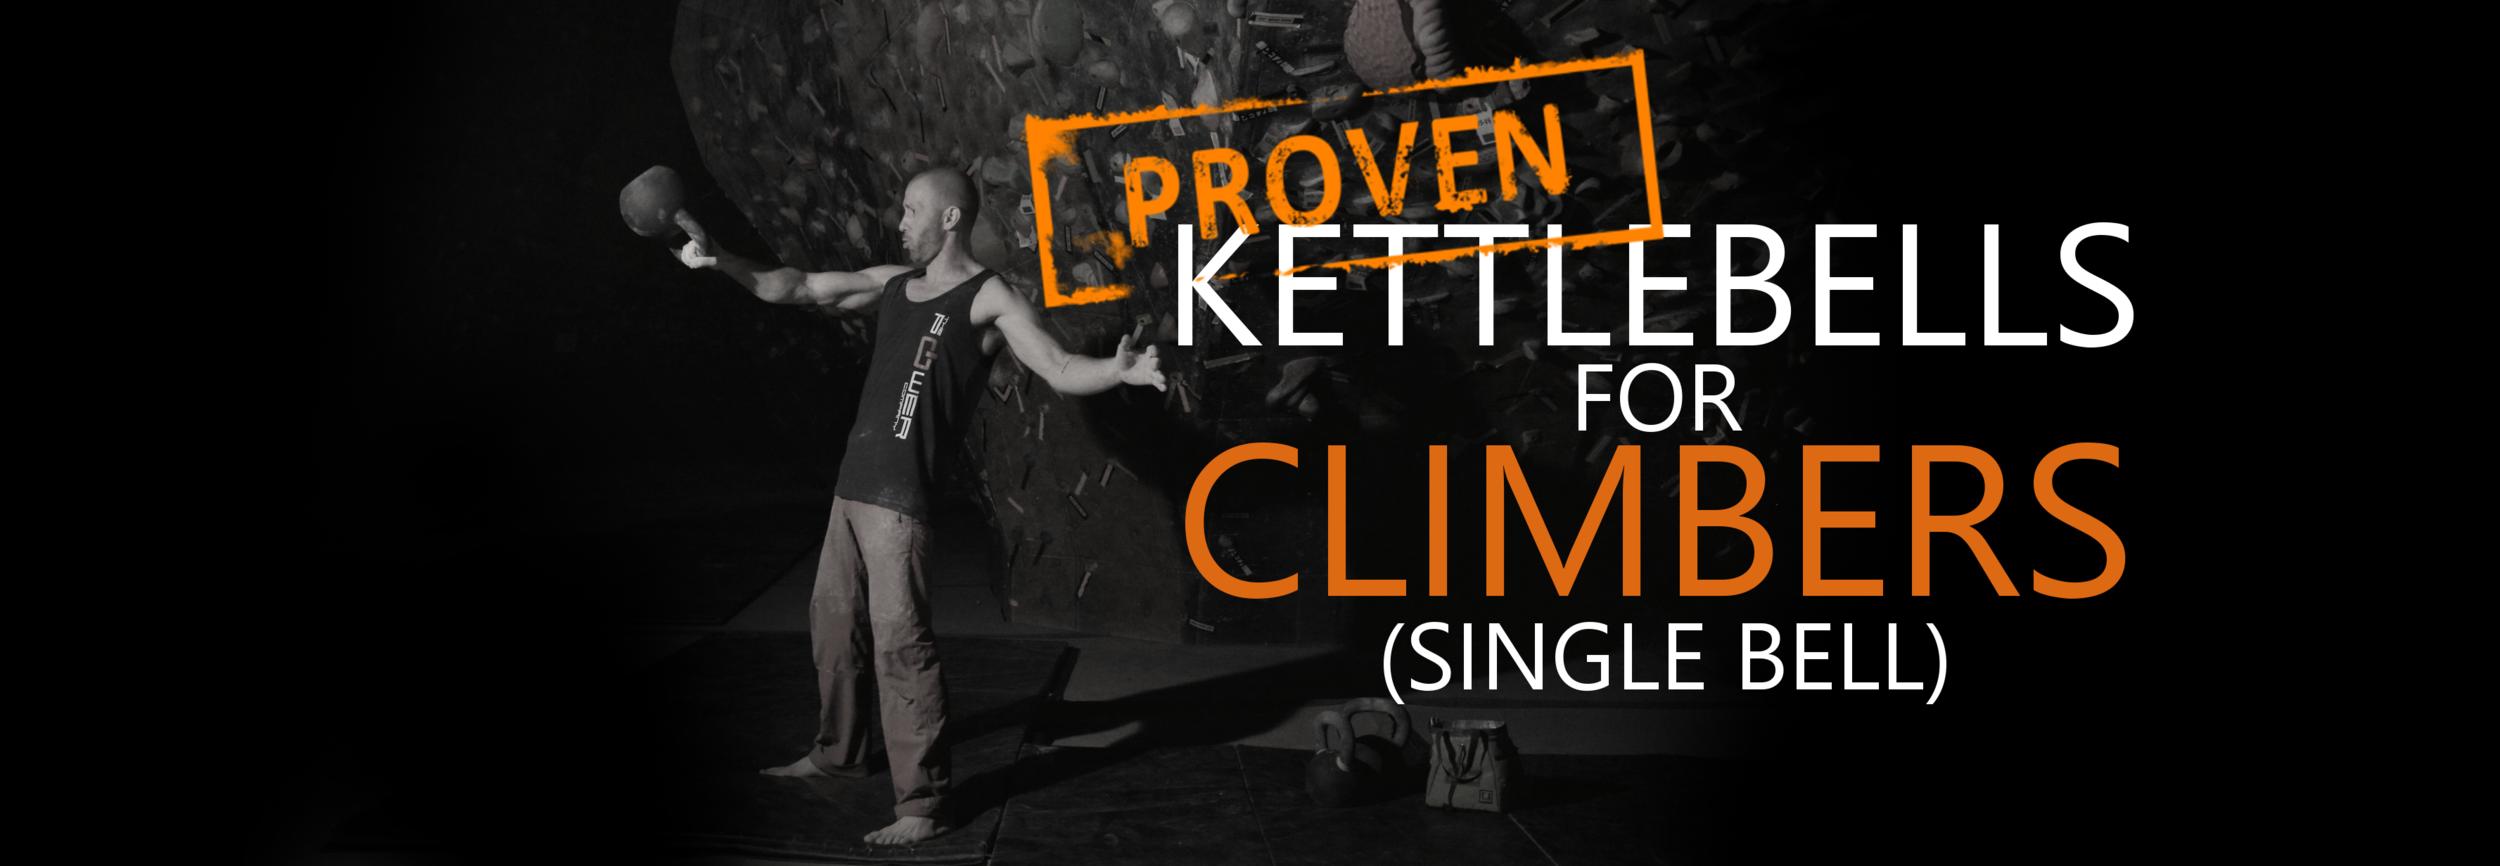 kettlebells for climbers